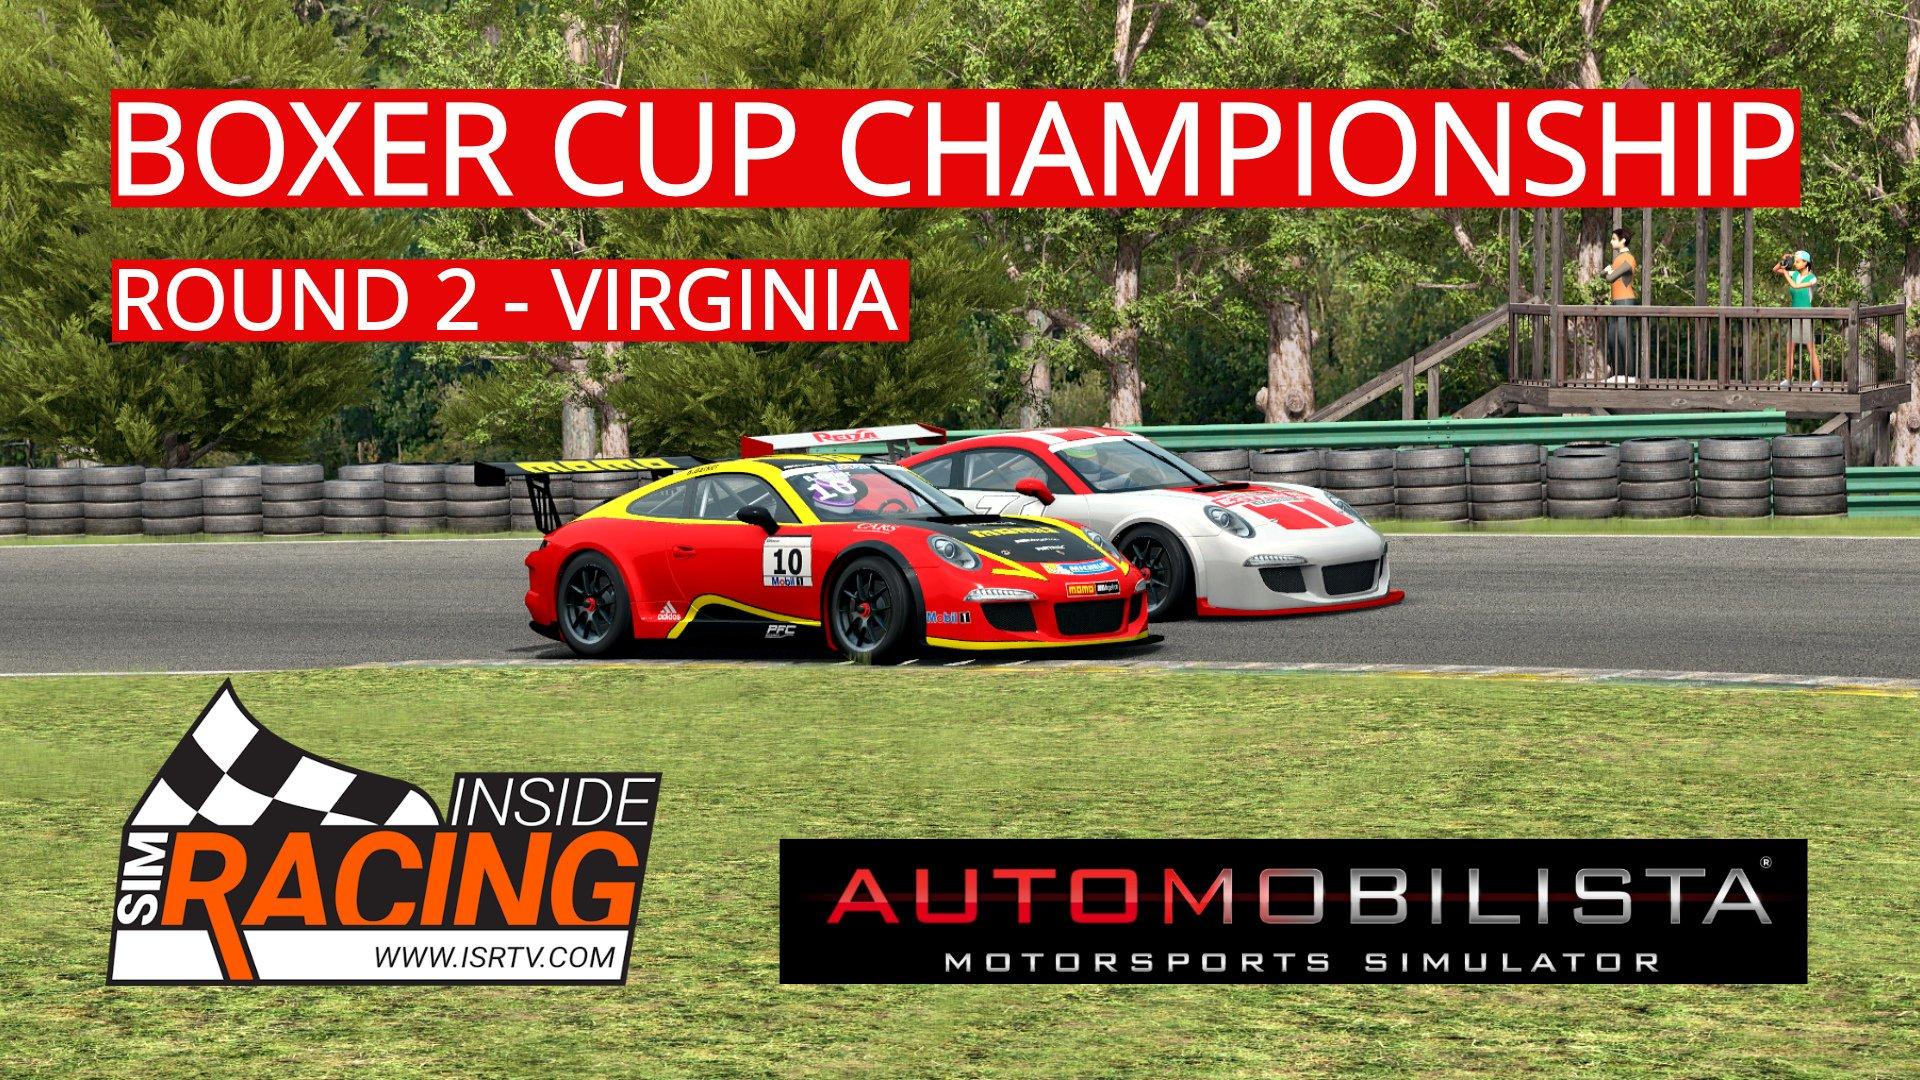 Automobilista-Boxer-Cup-Championship-Round-2-Virginia-TN